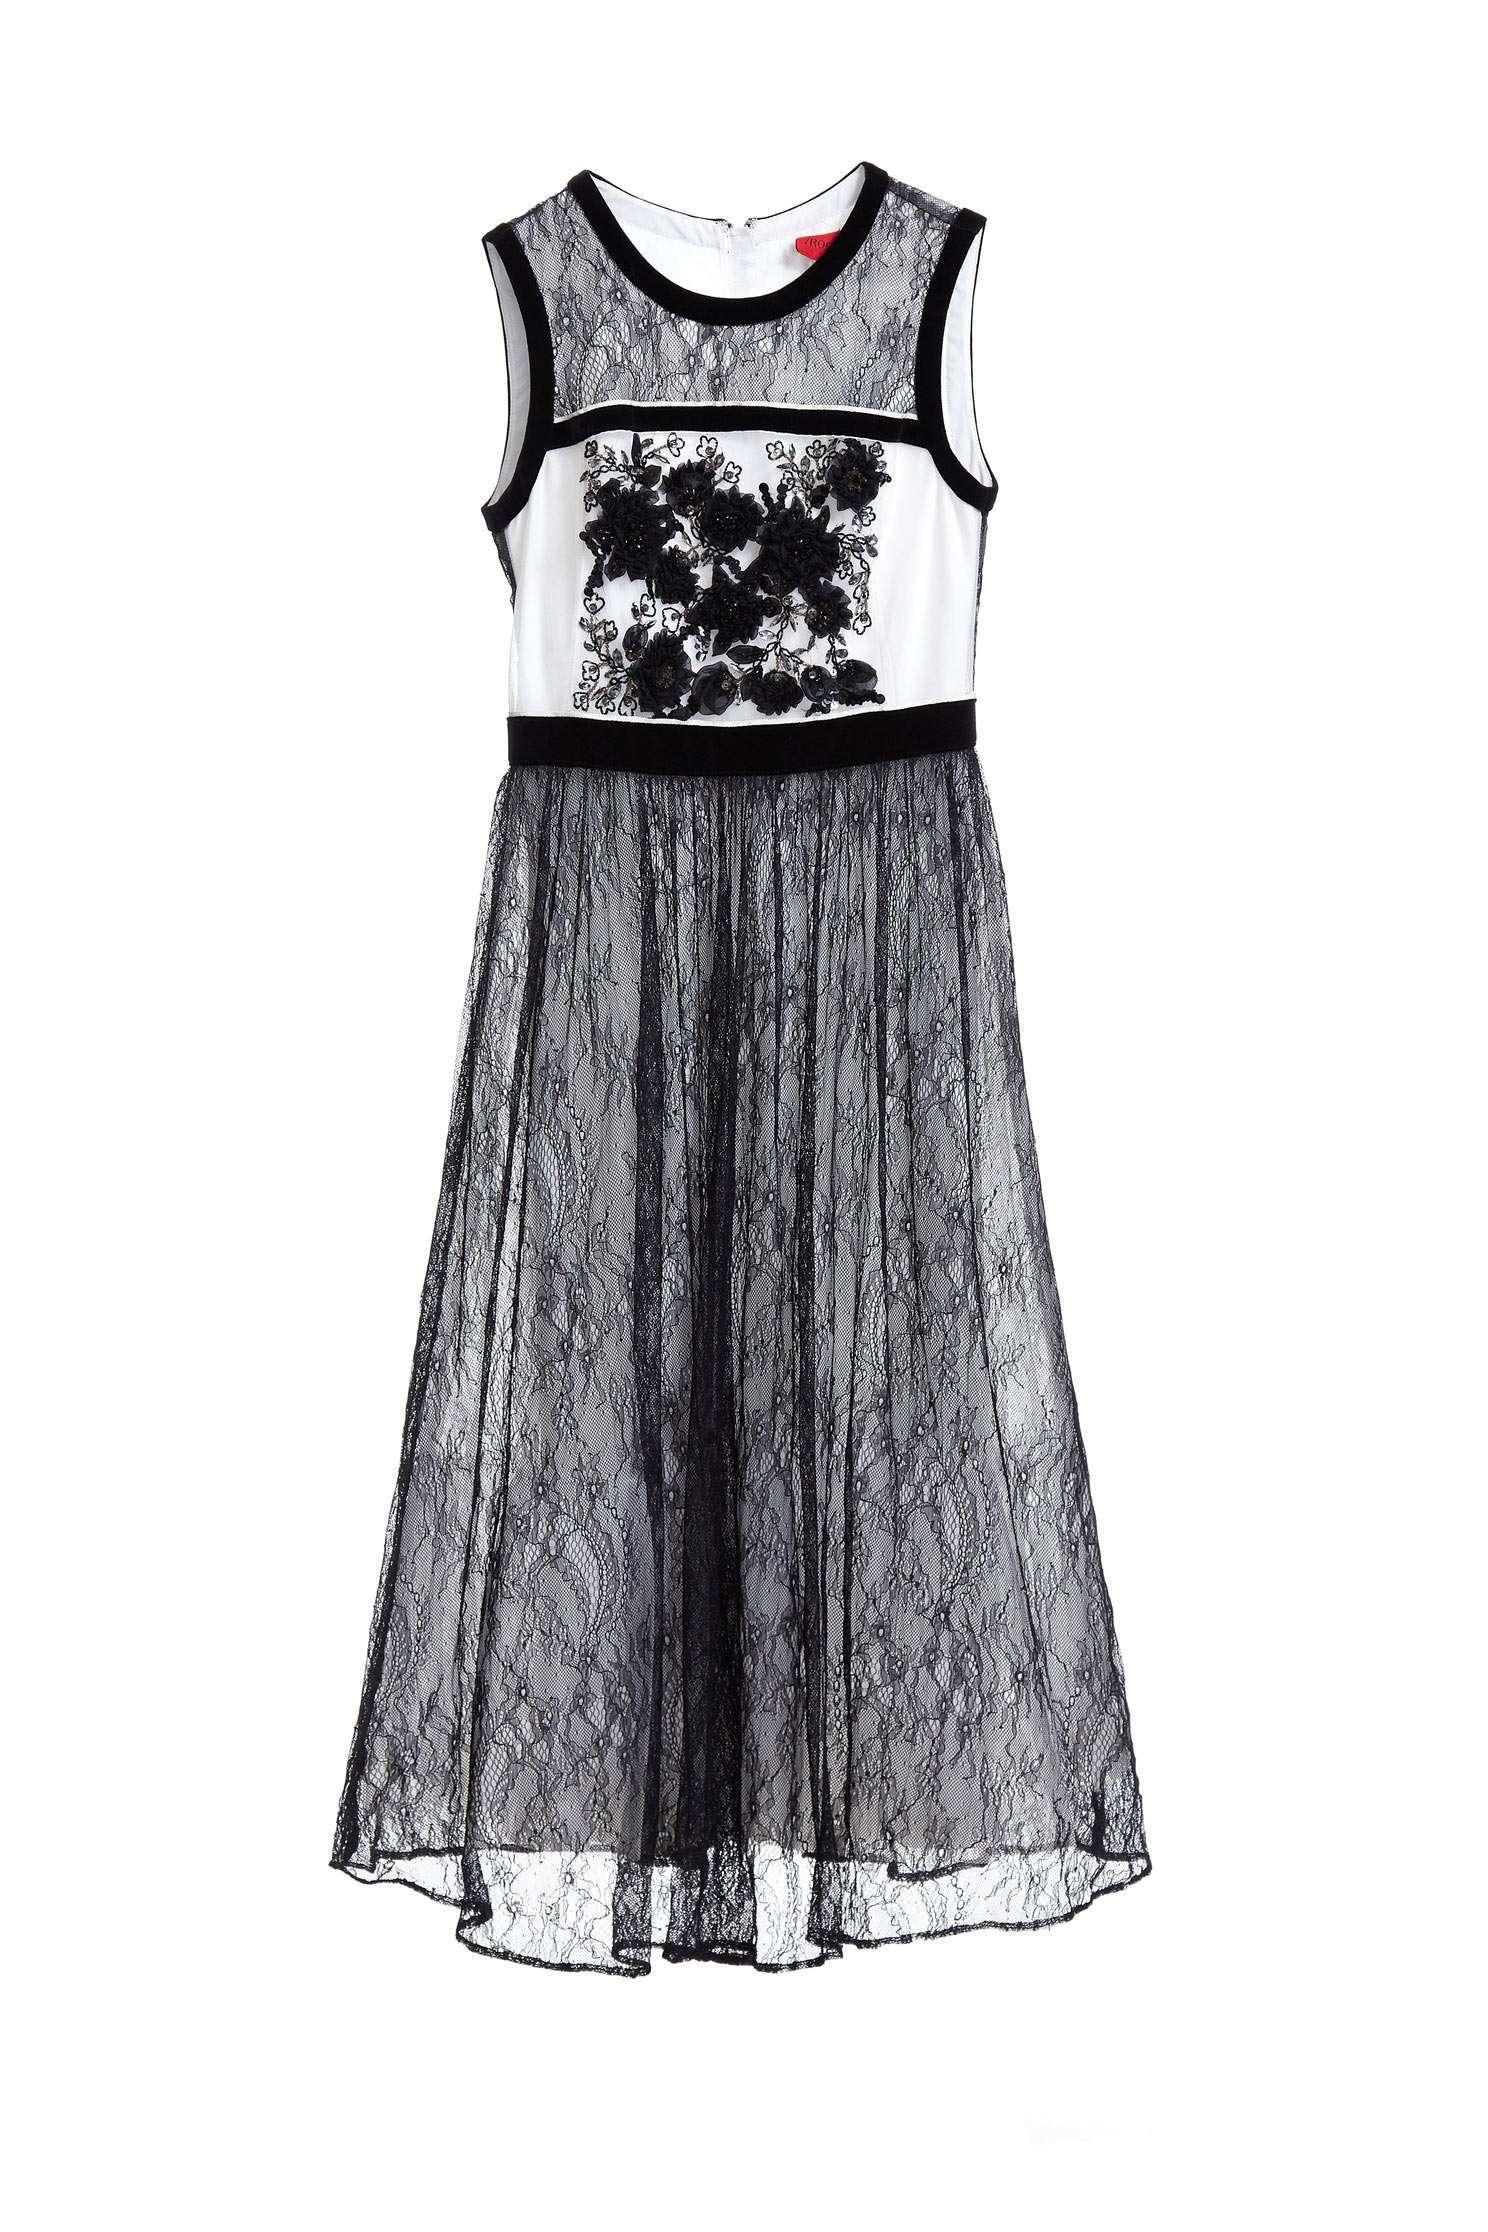 Graceful flowers emroidery dress,embroidery,embroiderddress,cocktaildress,sleevelessdress,eveningwear,embroidered,lace,lacedress,perspectivedress,blackdress